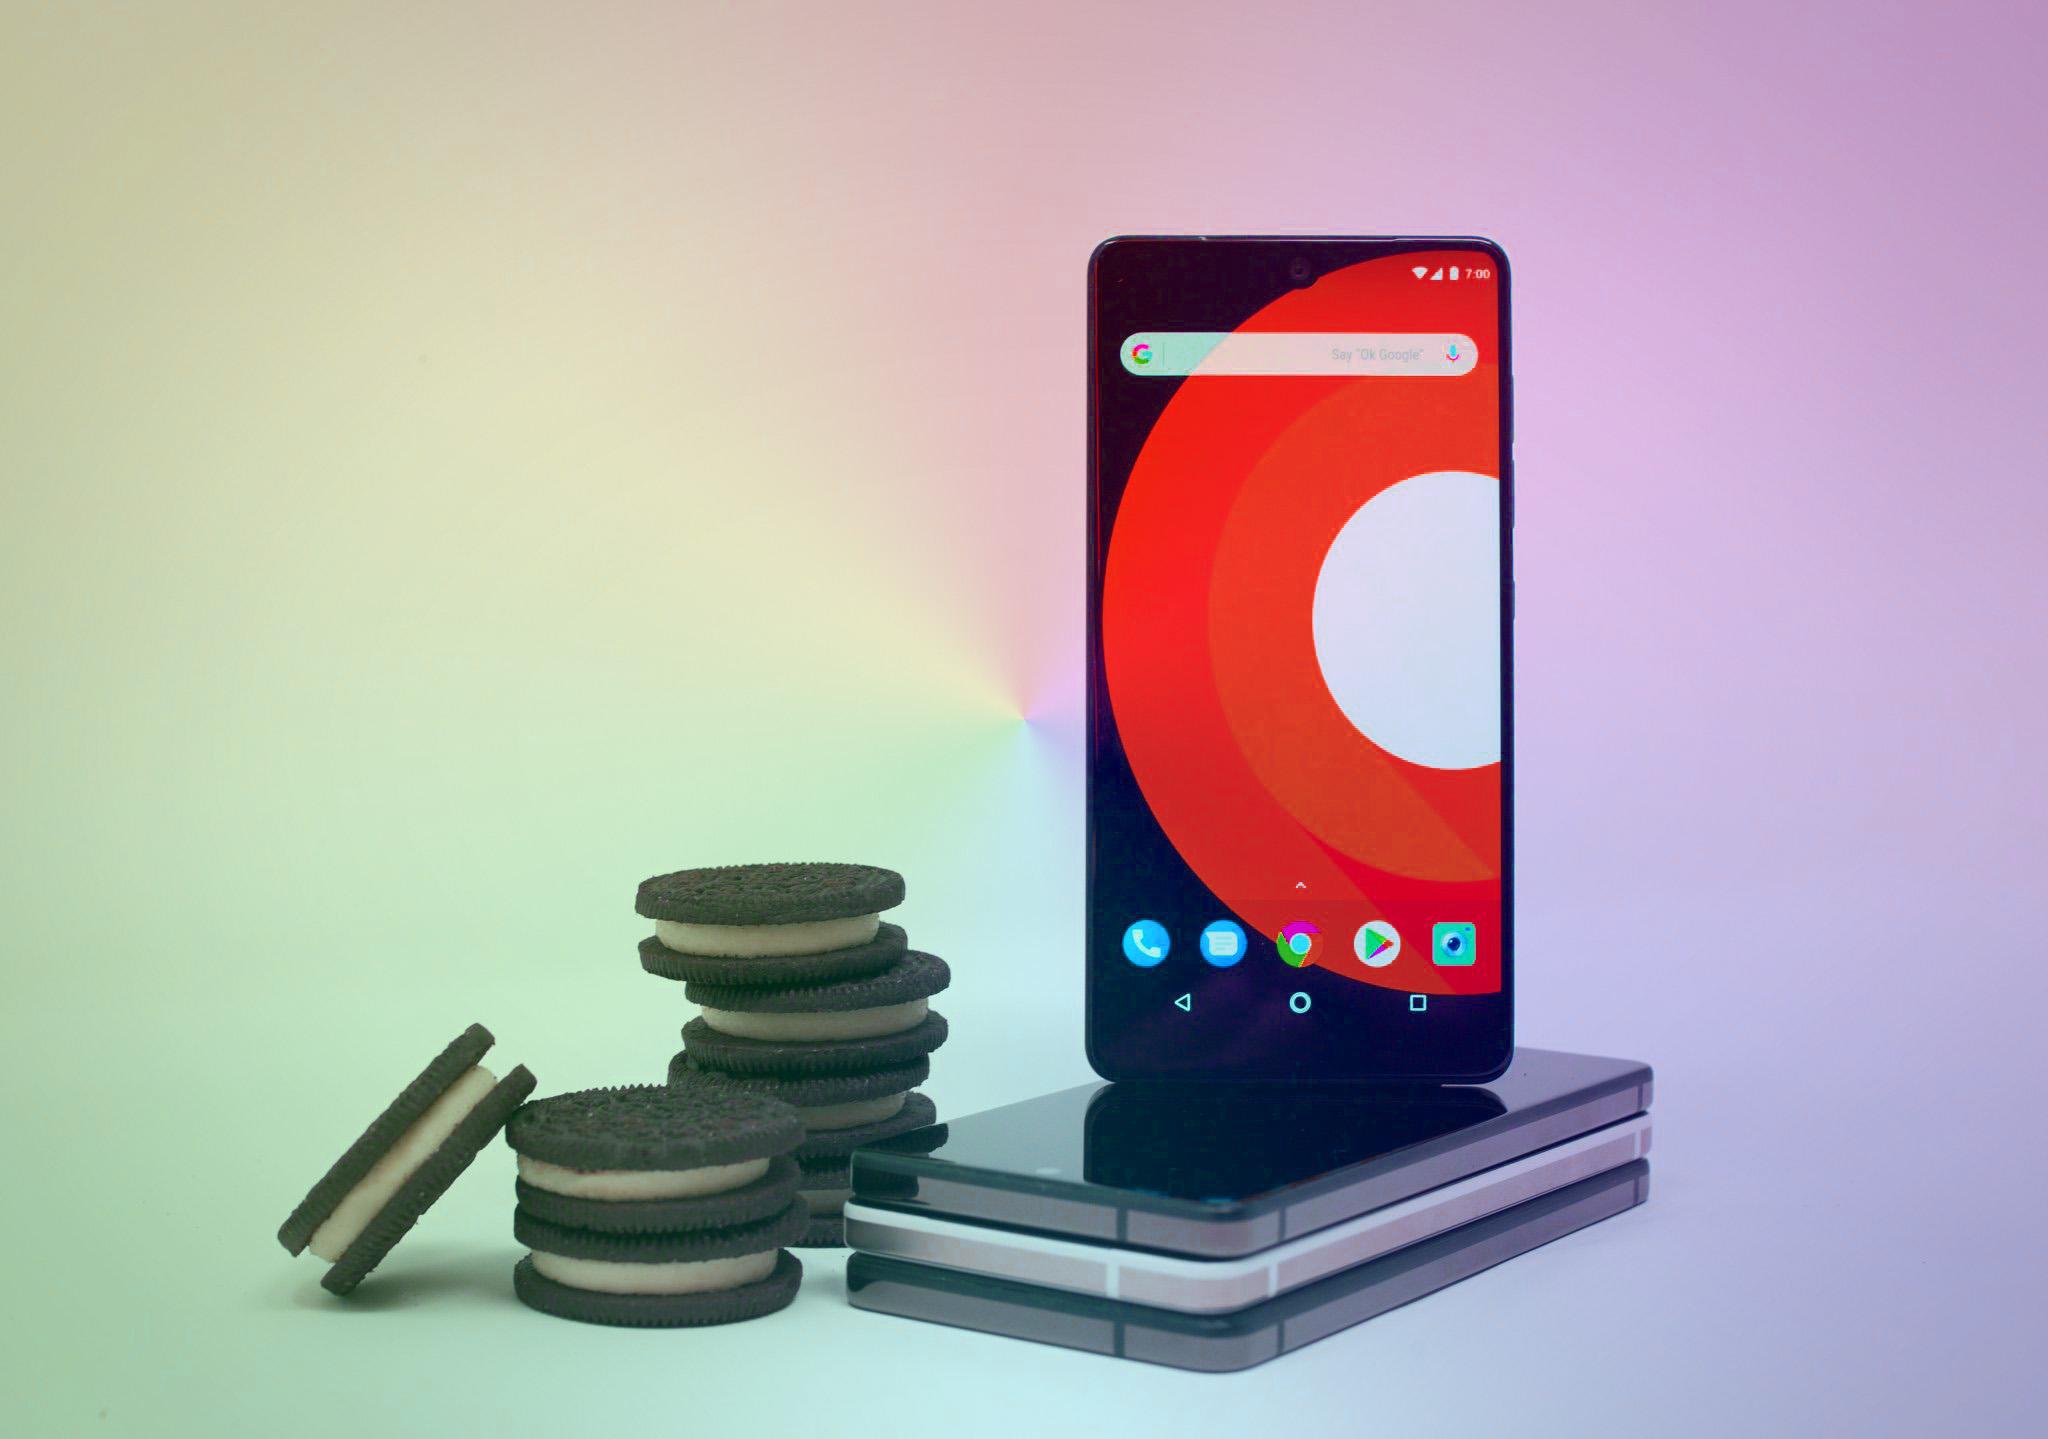 essential-phone-Oreo-release